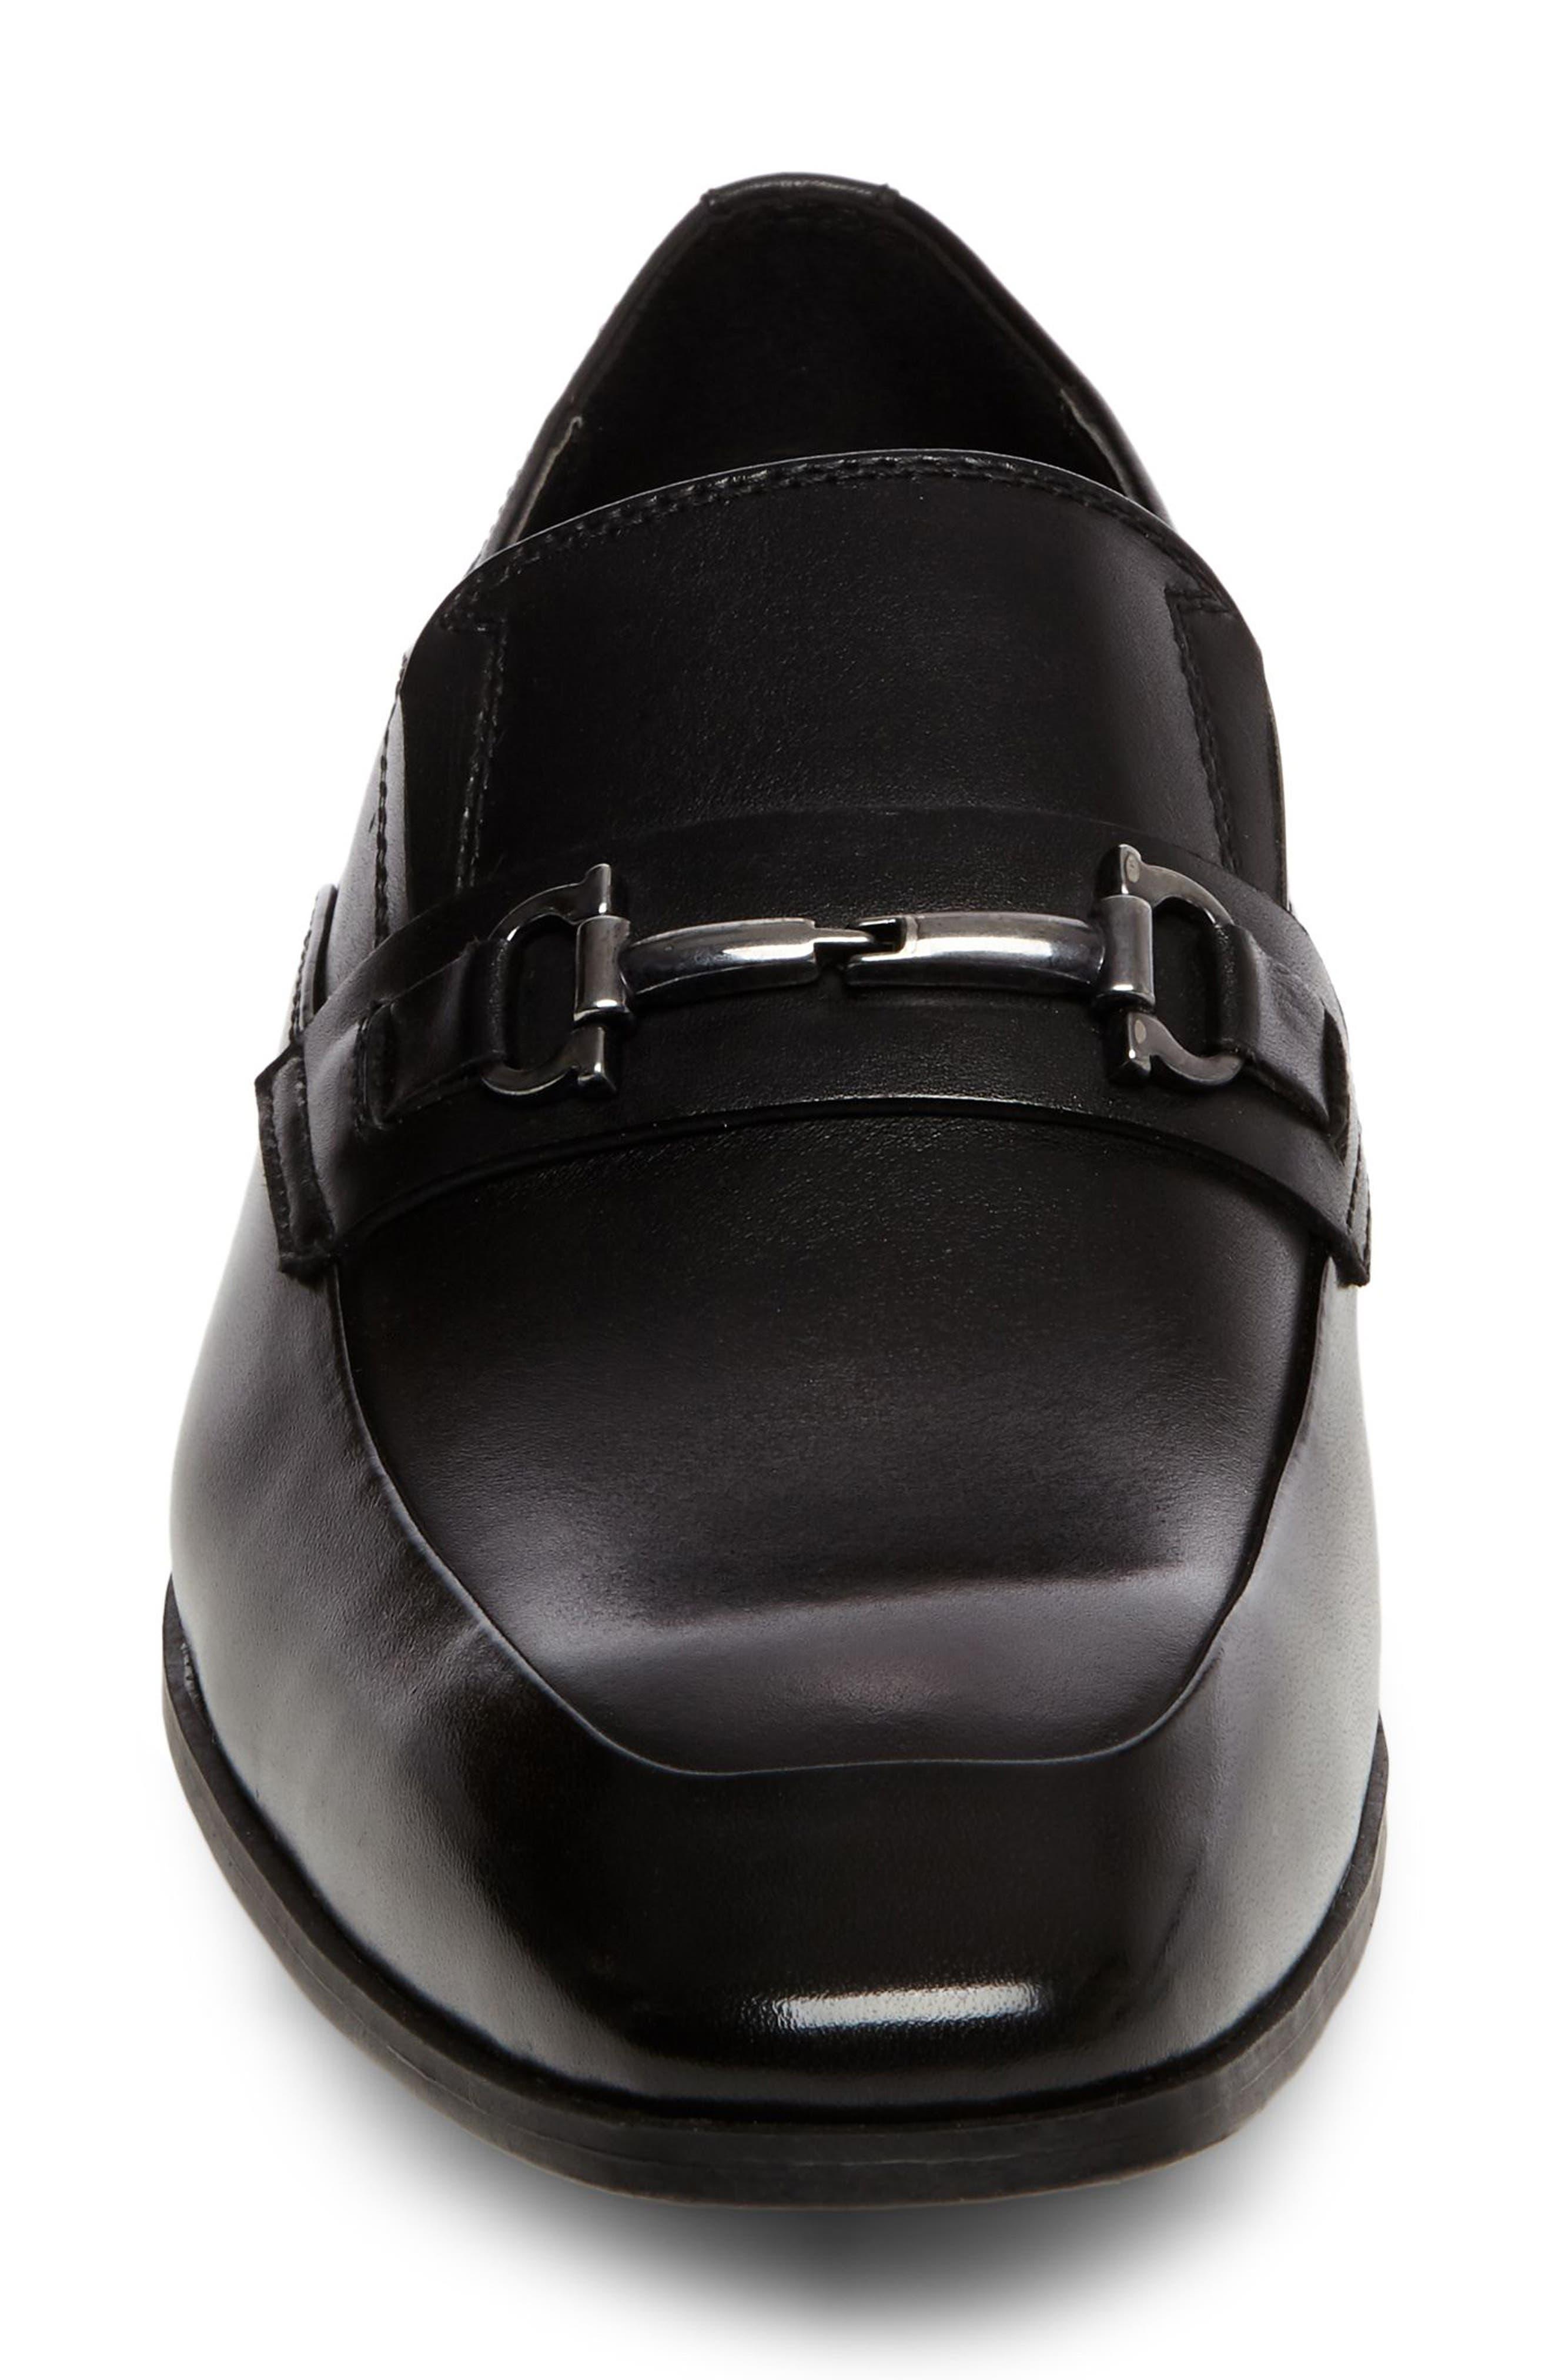 Mendal Bit Loafer,                             Alternate thumbnail 4, color,                             Black